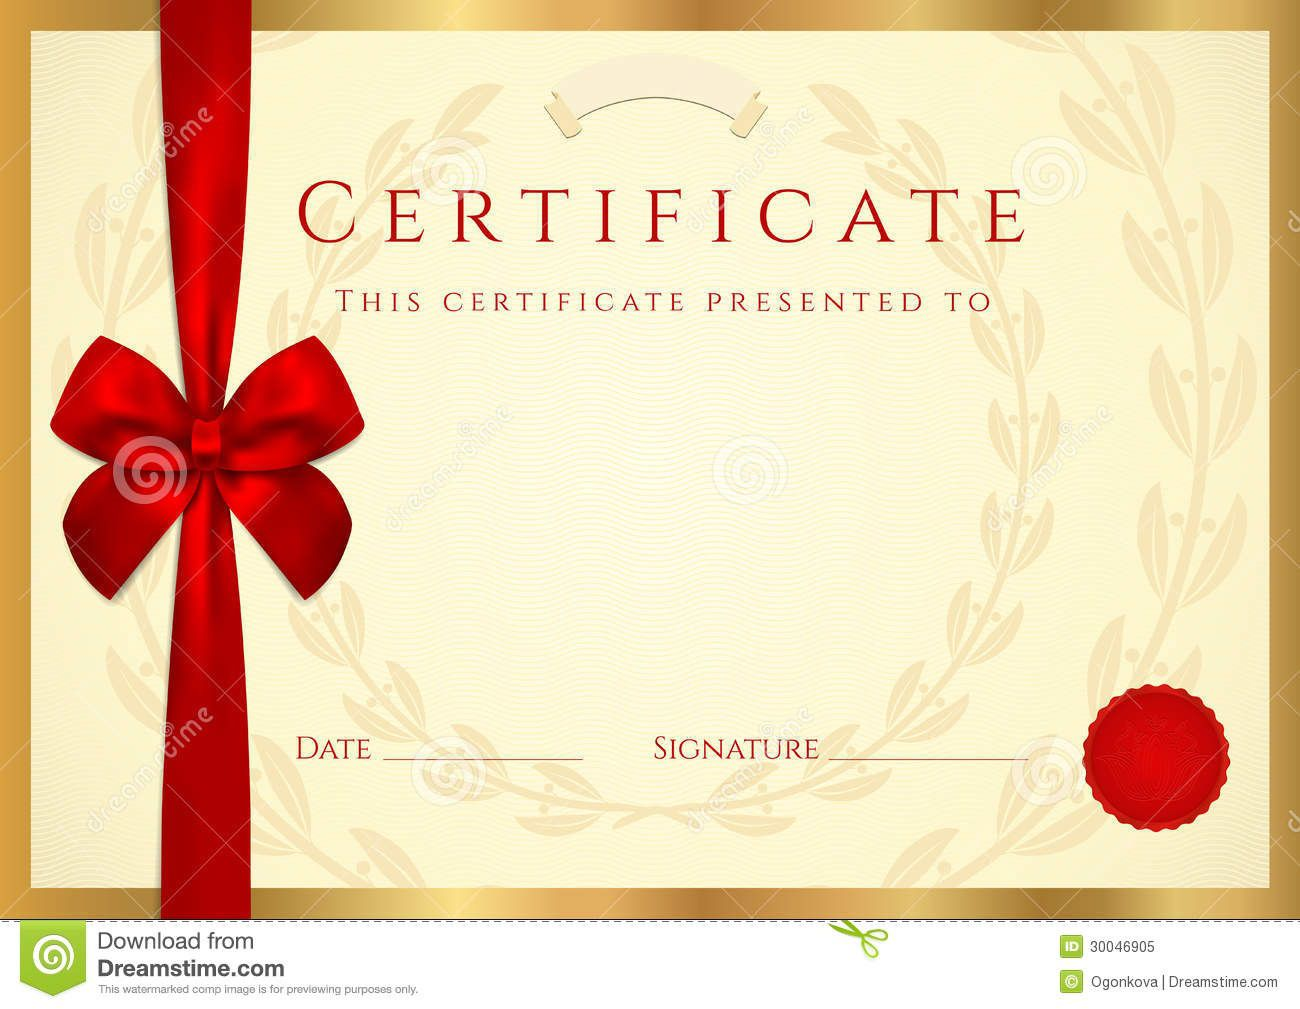 004 Imposing Free Diploma Template Download High Def  Word Certificate School AppreciationFull